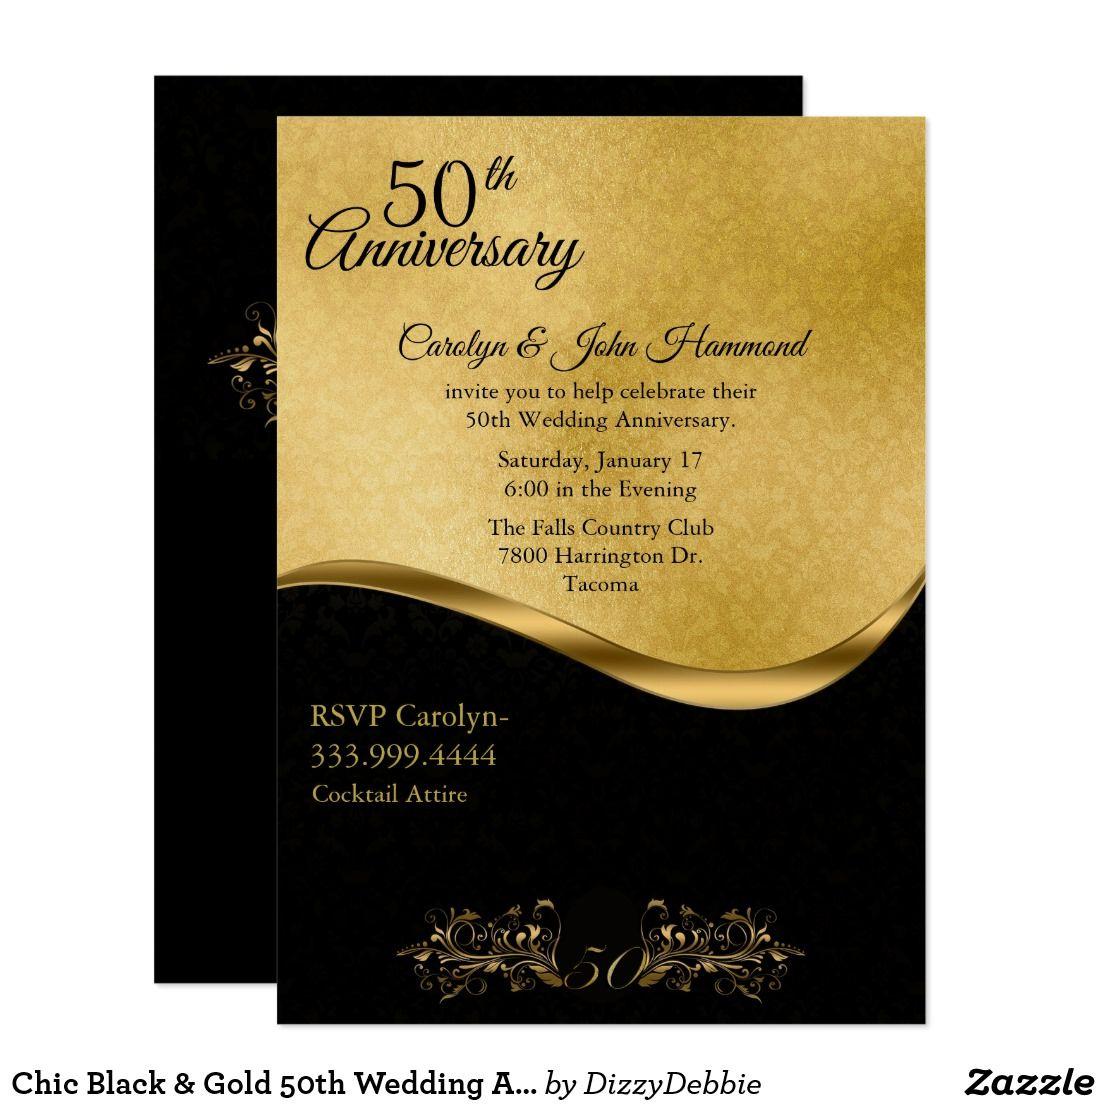 Chic Black Gold 50th Wedding Anniversary Invitation Zazzle Com 50th Wedding Anniversary Invitations 50th Wedding Anniversary Wedding Anniversary Invitations